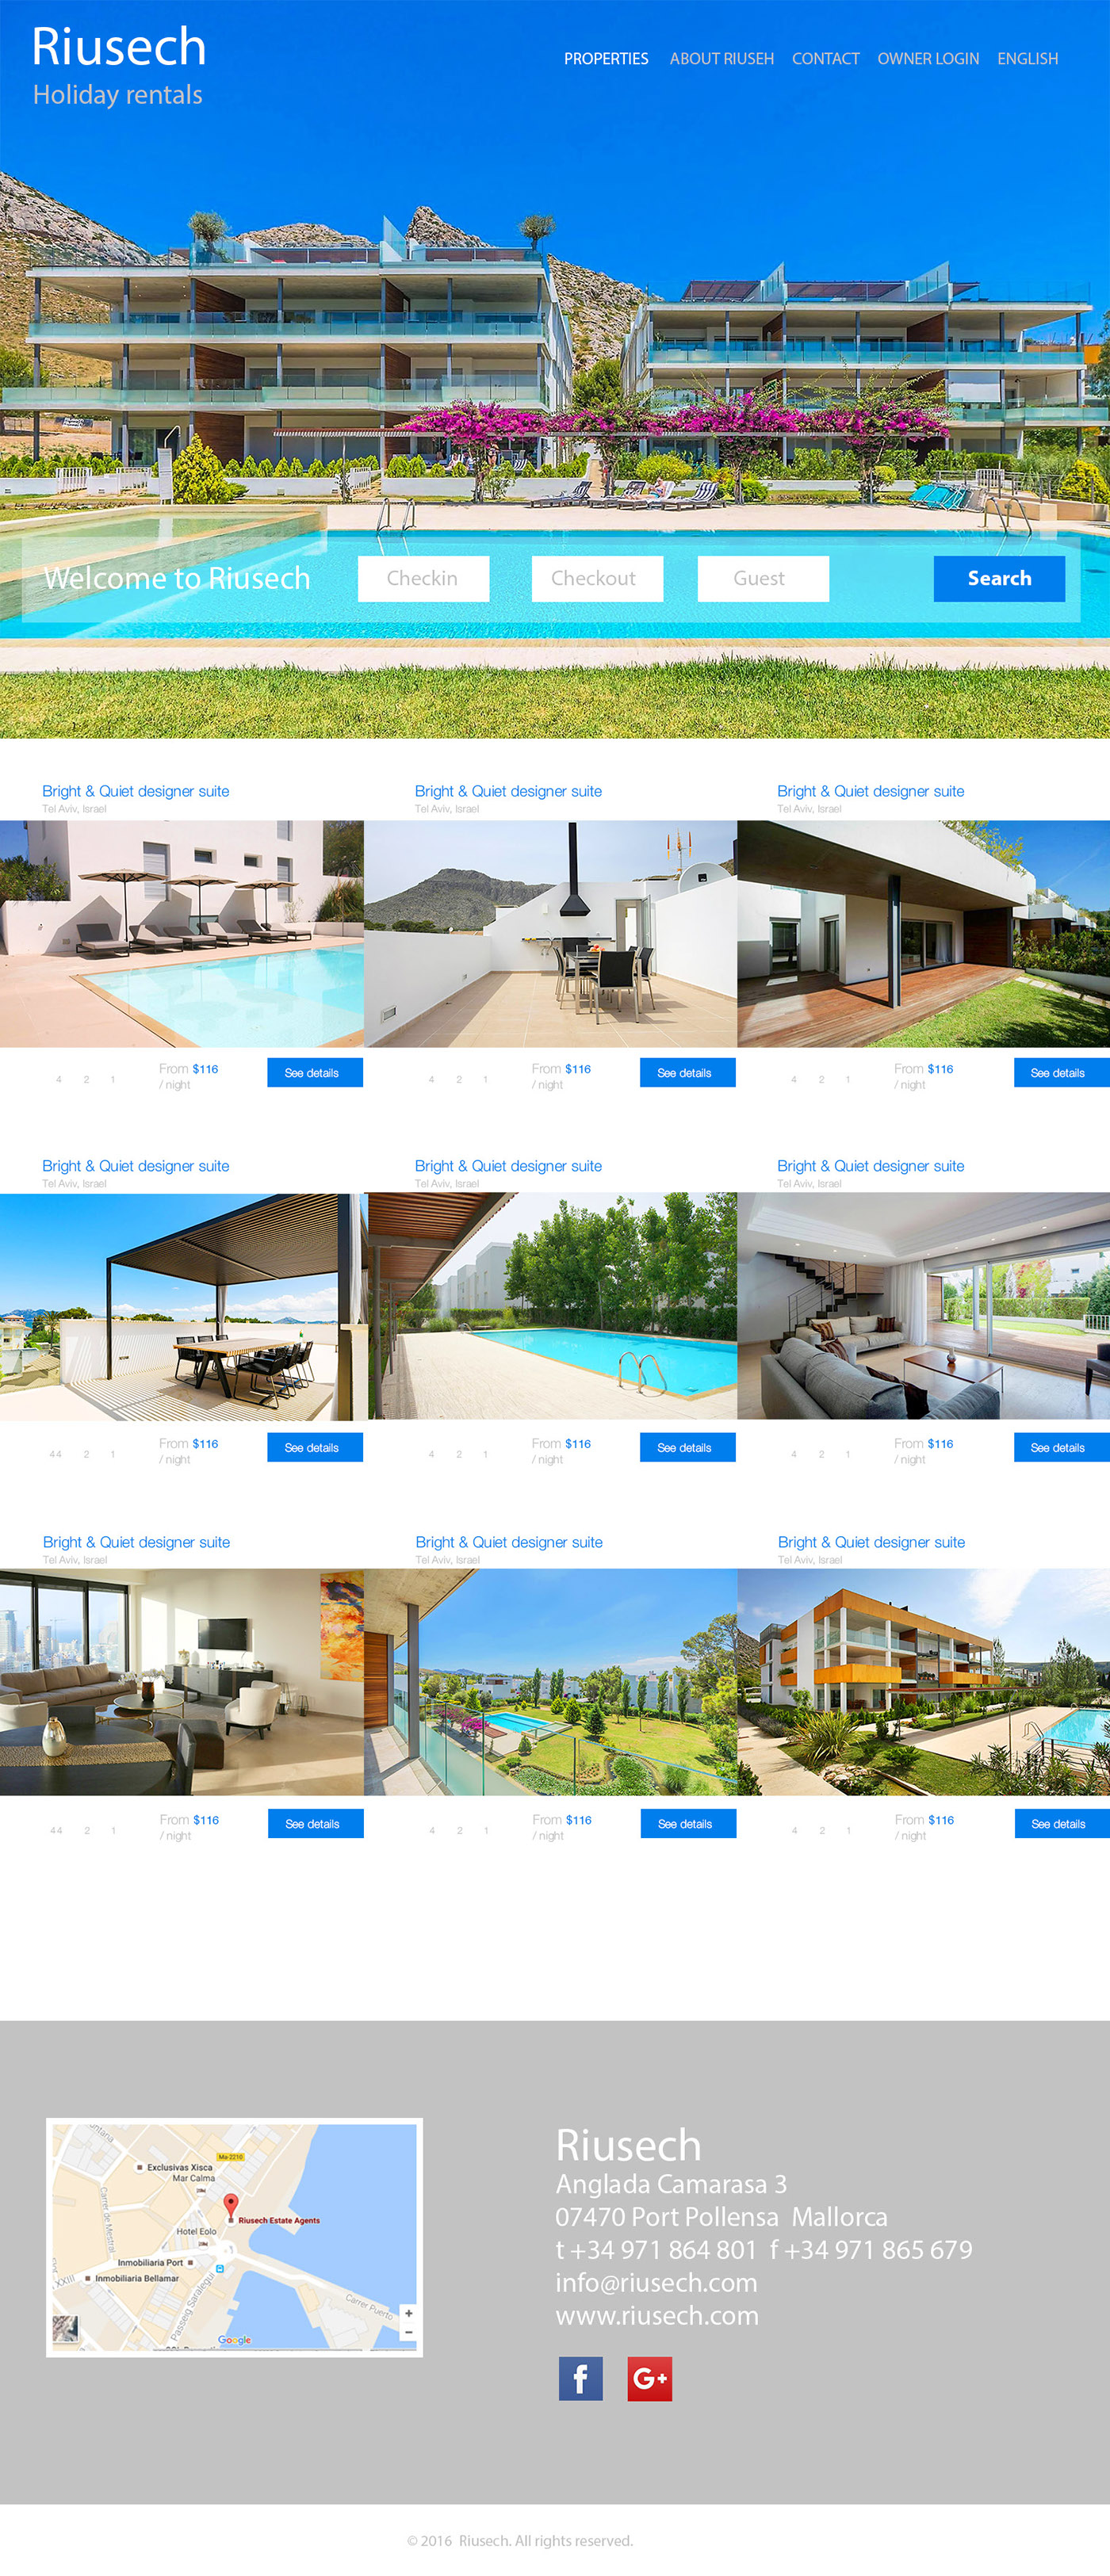 Riusech Holiday Rentals Web design